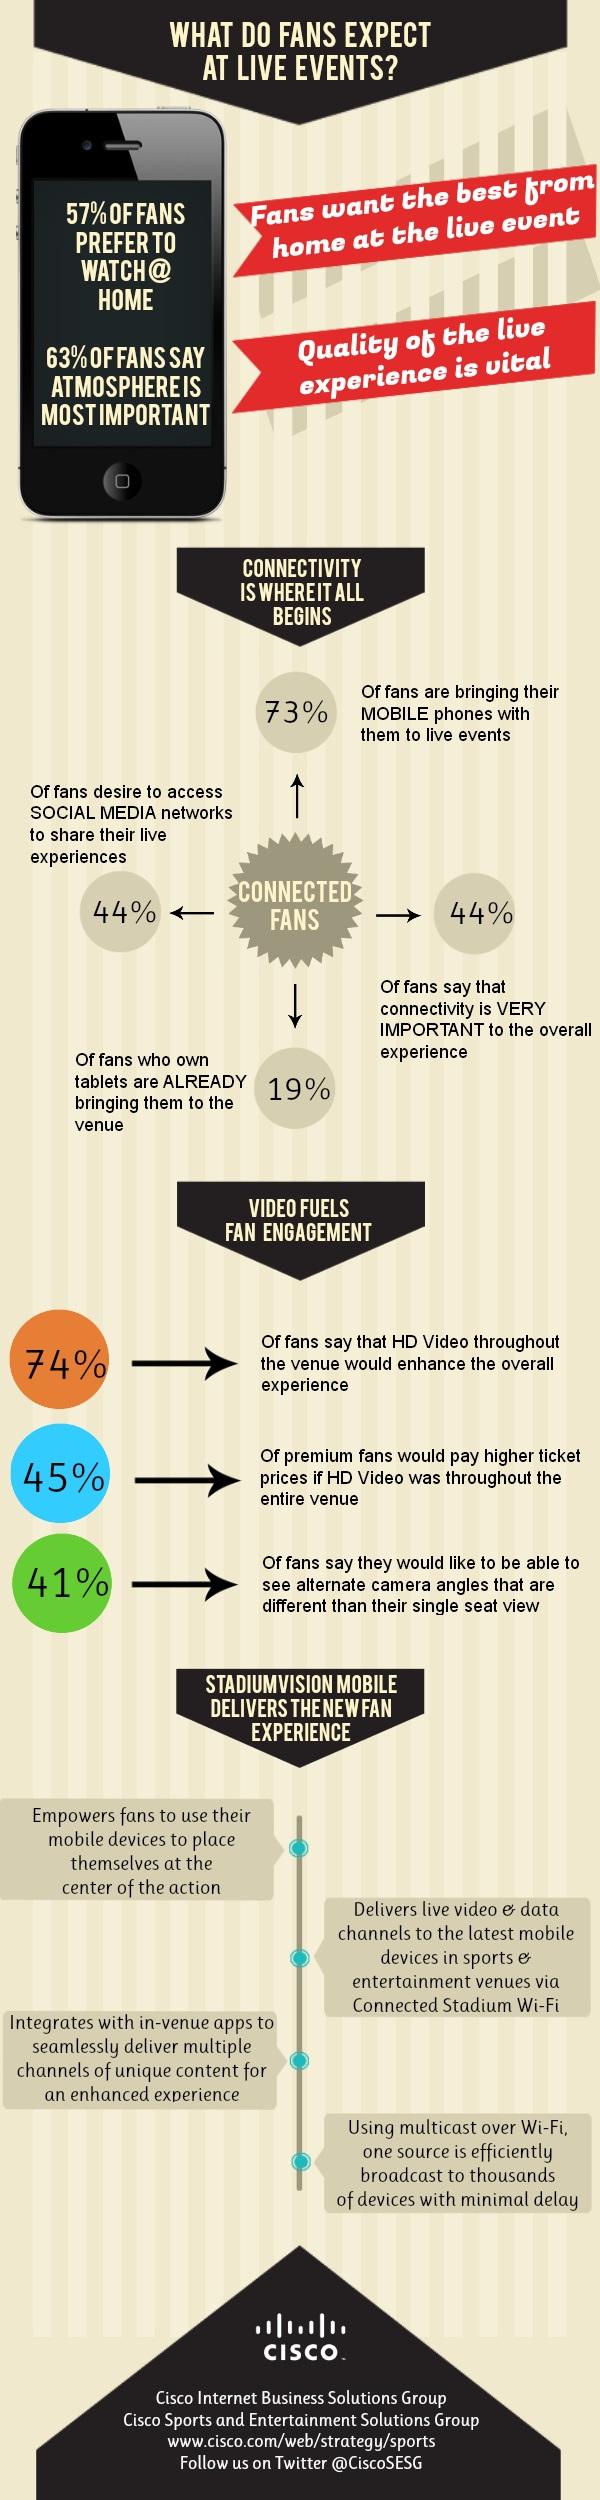 Cisco SV Mobile & IBSG Fan Survey Infographic